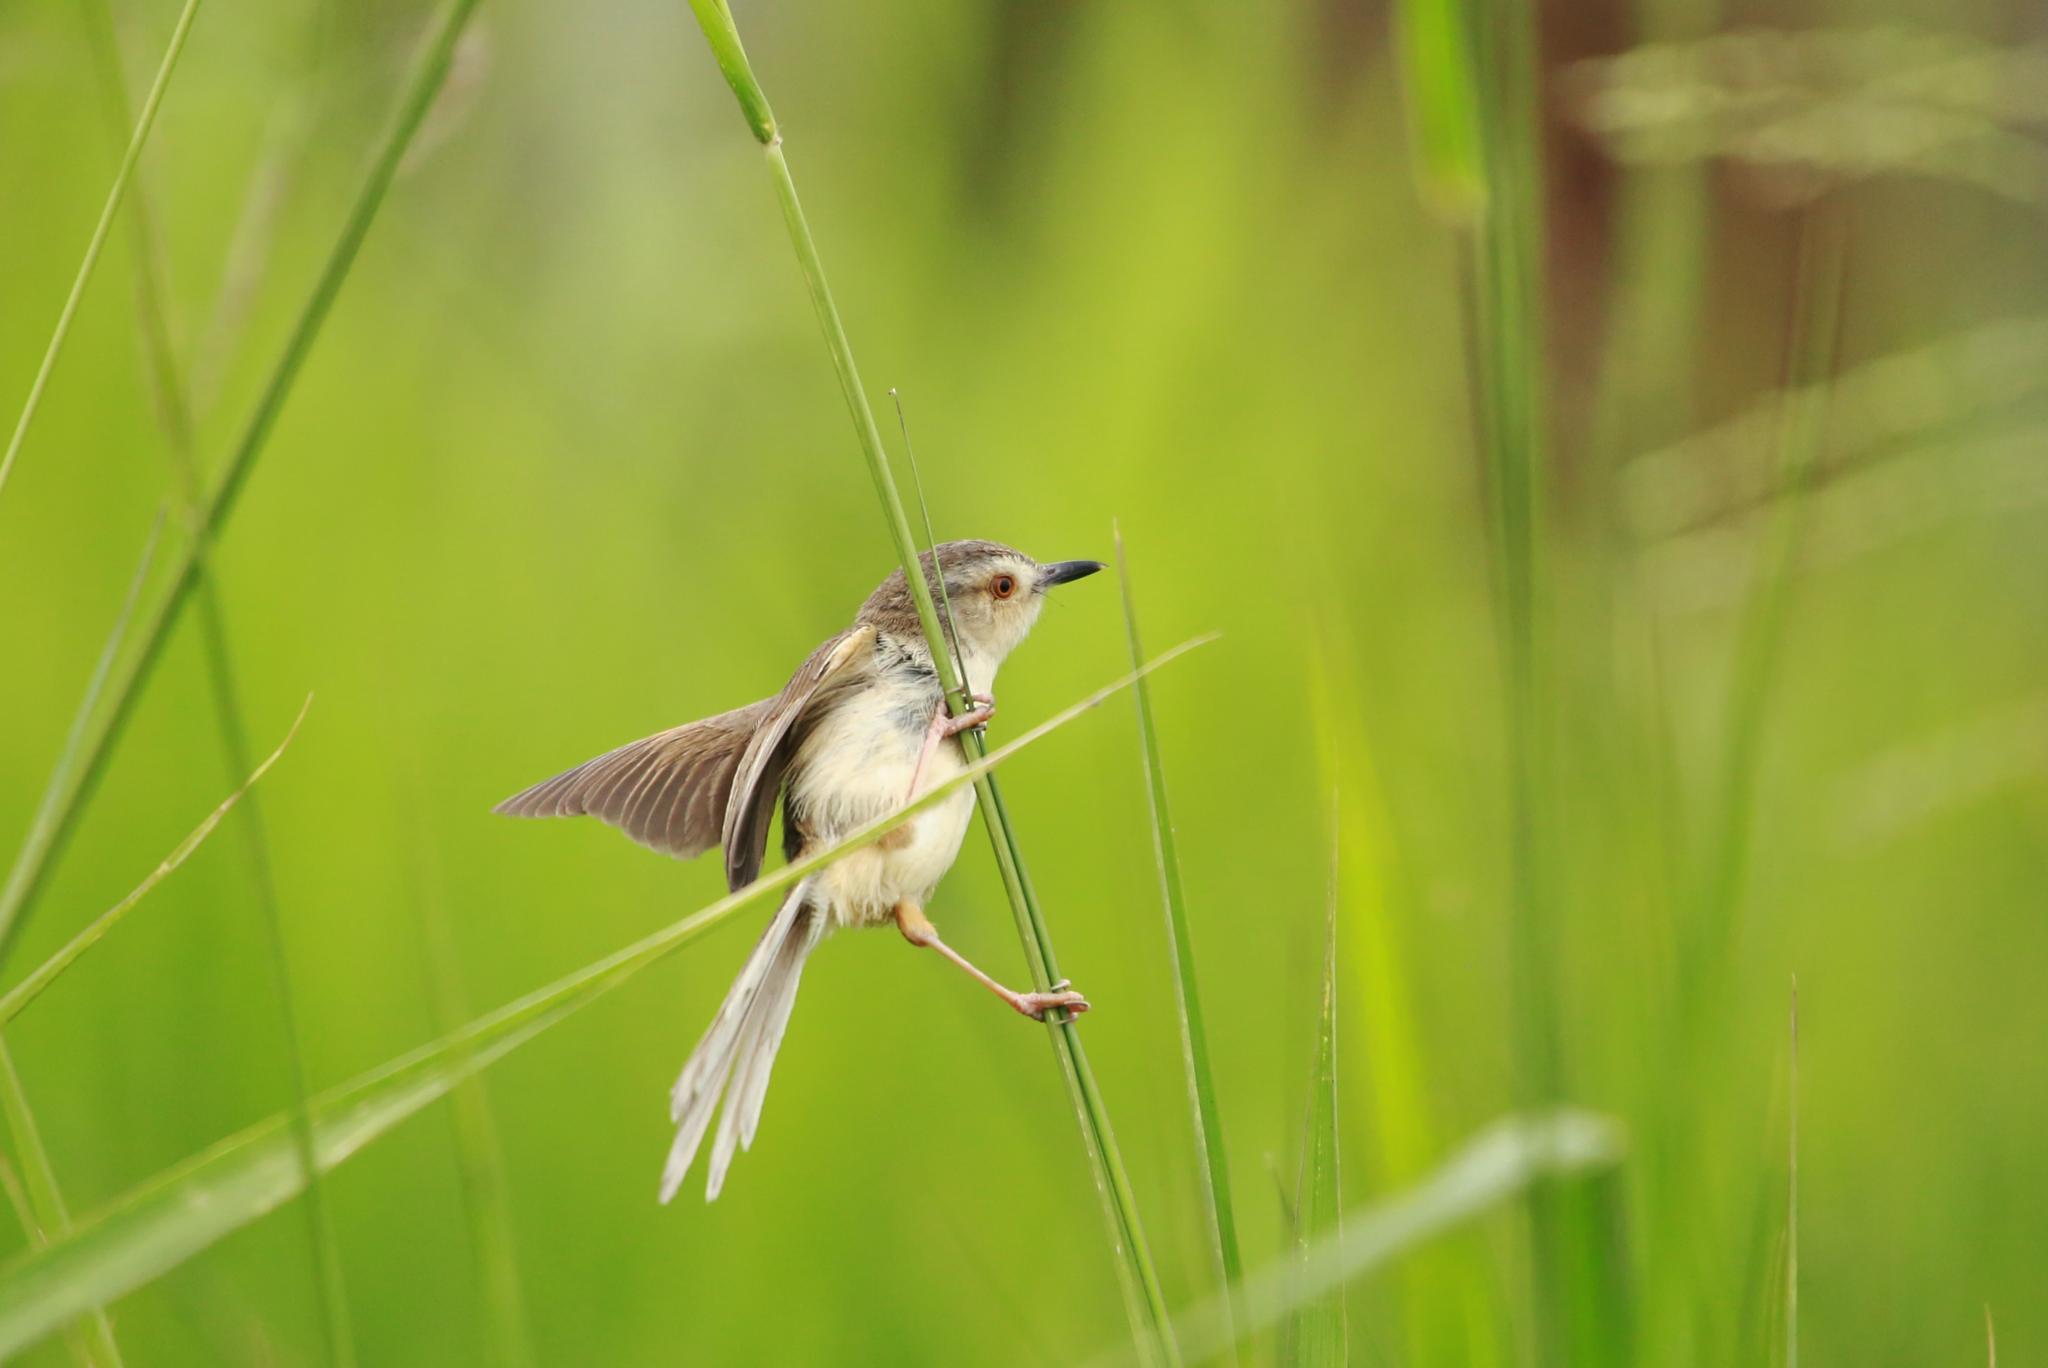 The landing bird. by samip75